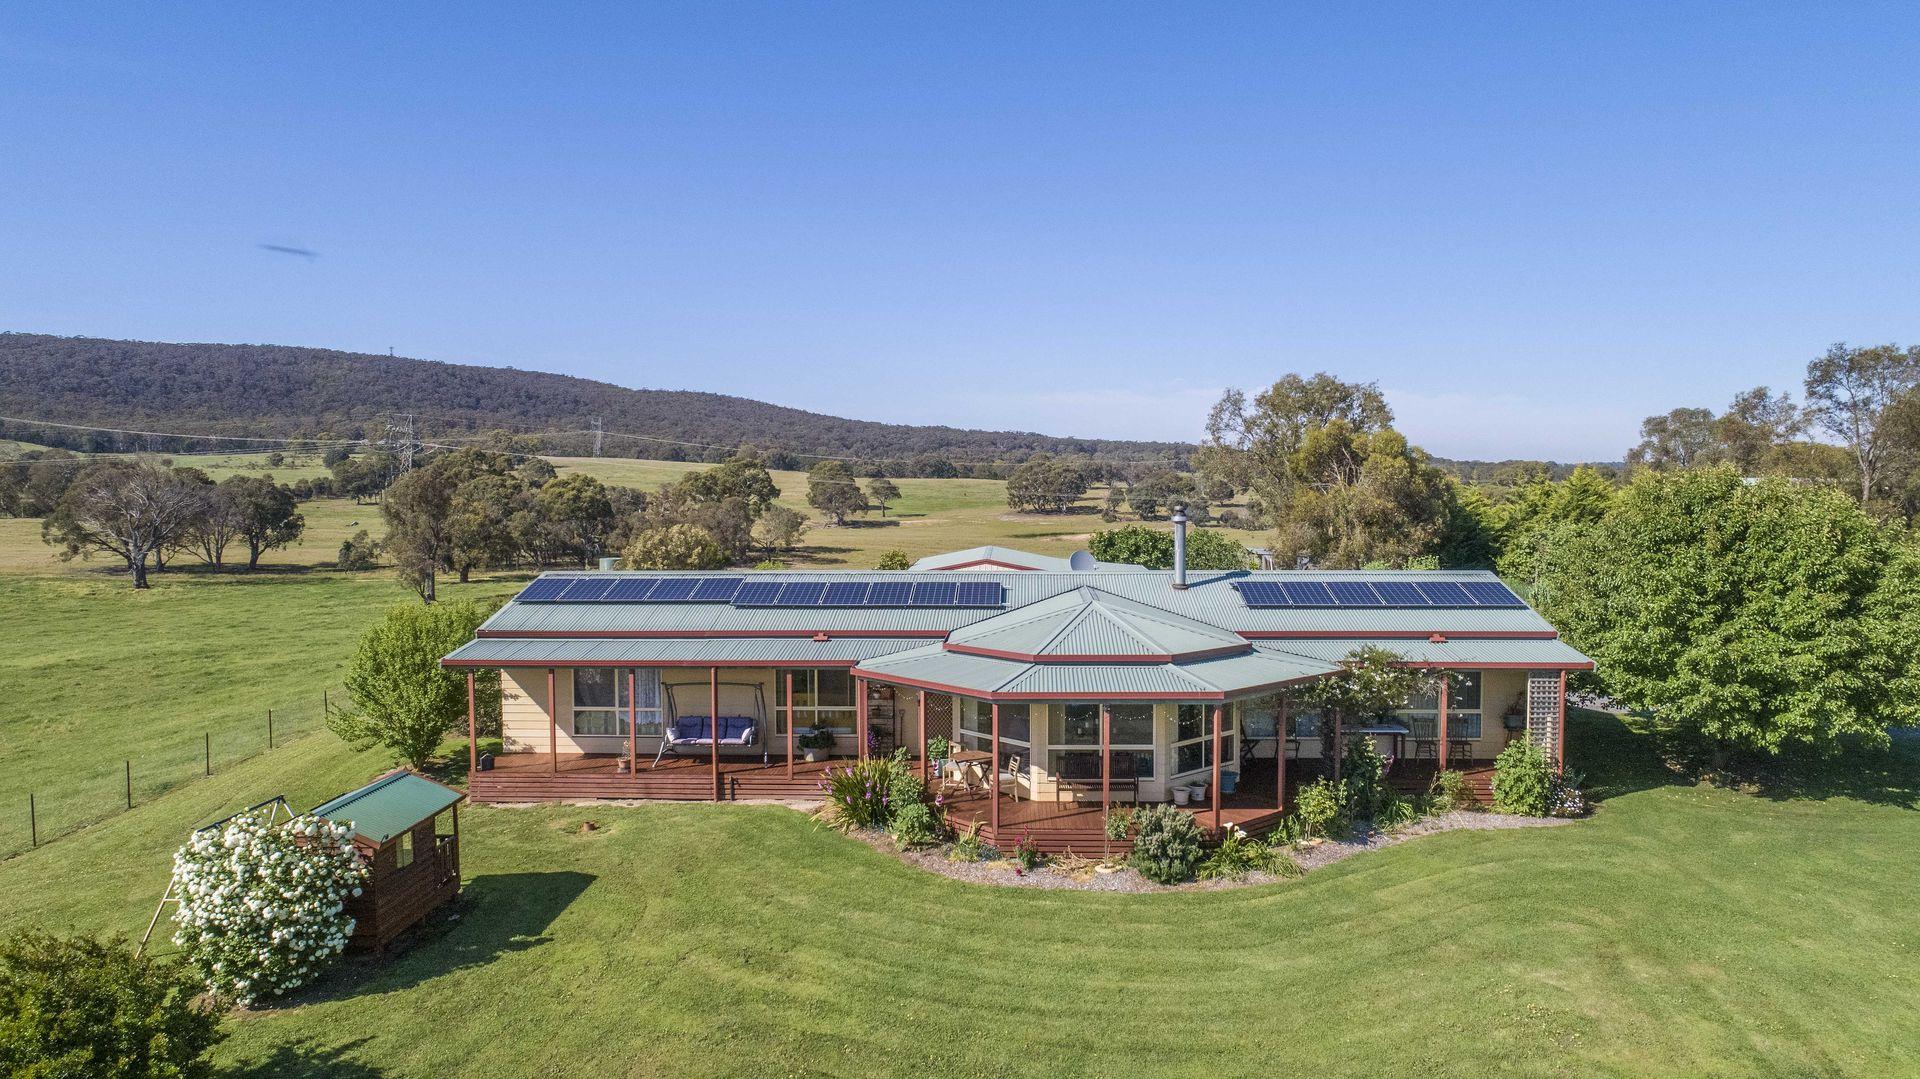 7550 Federal  Highway, Yarra NSW 2580, Image 1